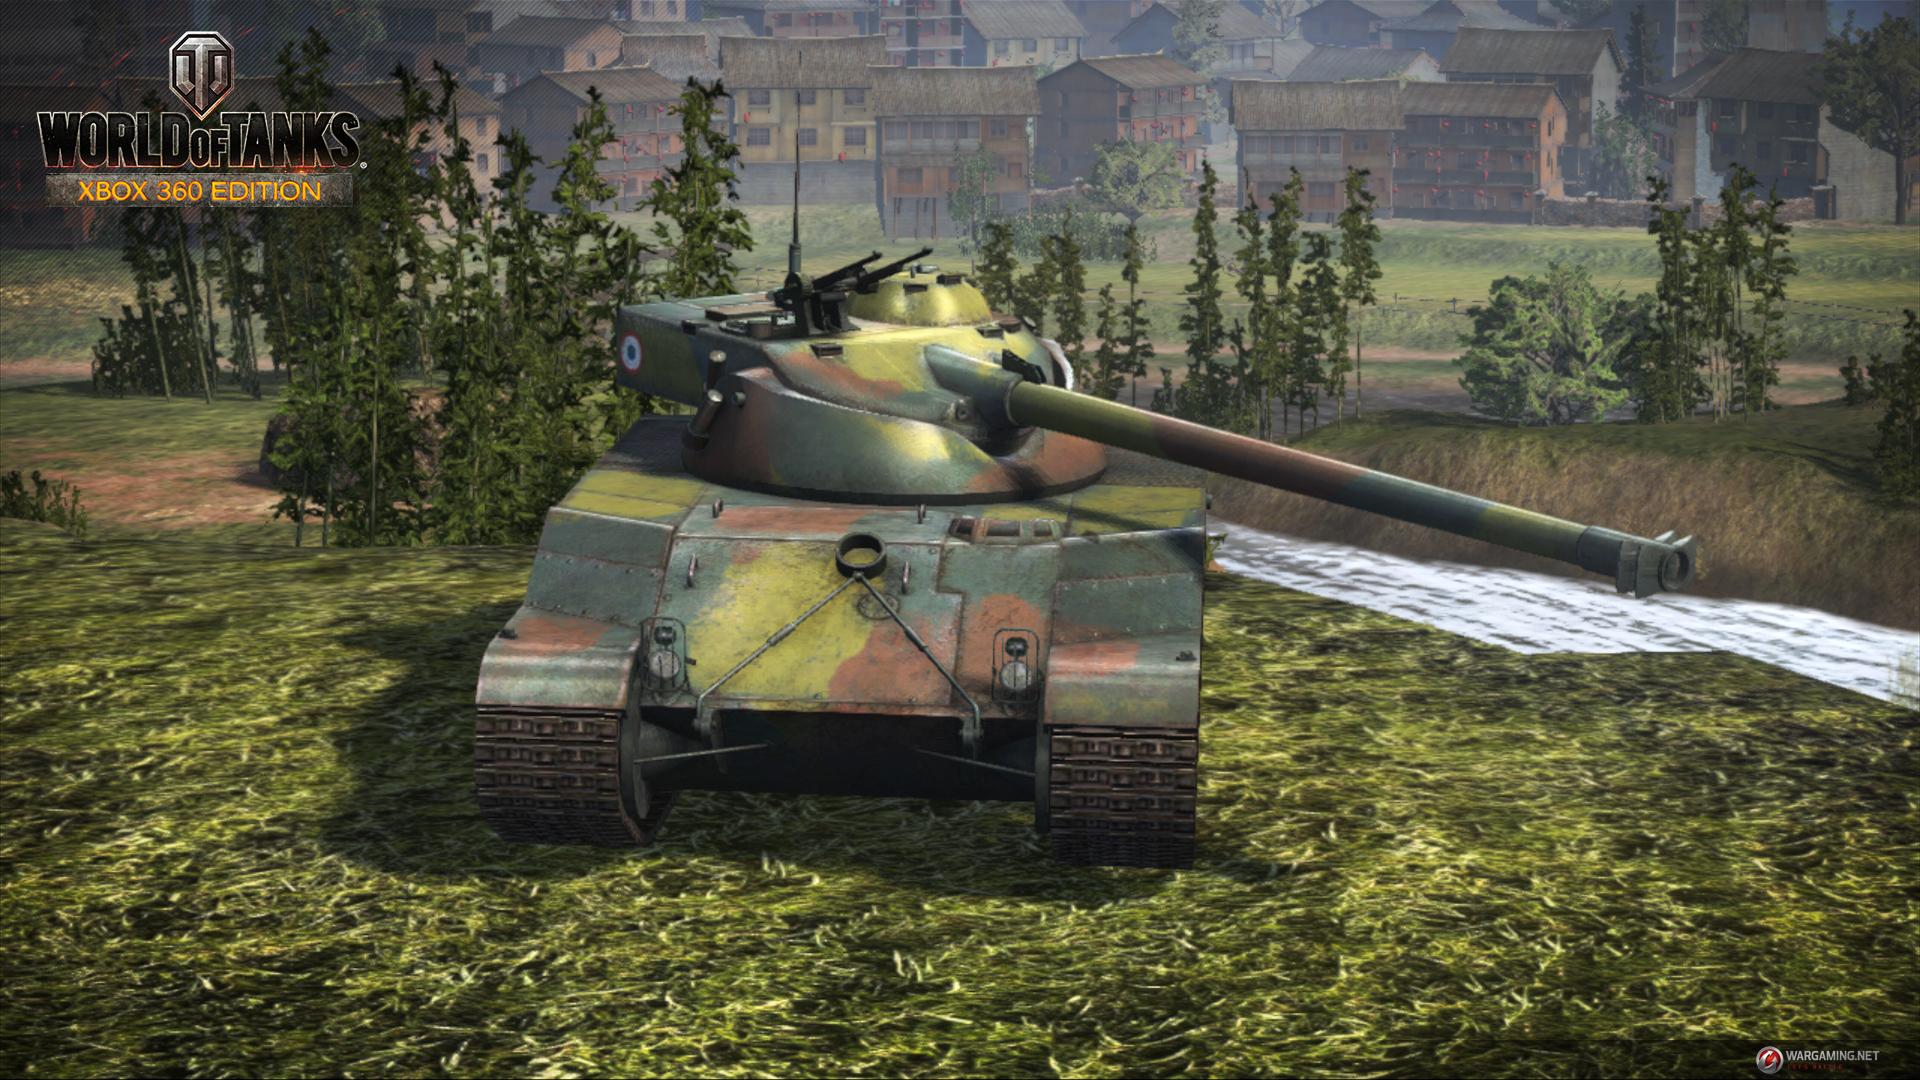 WoT_Xbox_360_Edition_Screens_Vive_la_France_Update_Image_05